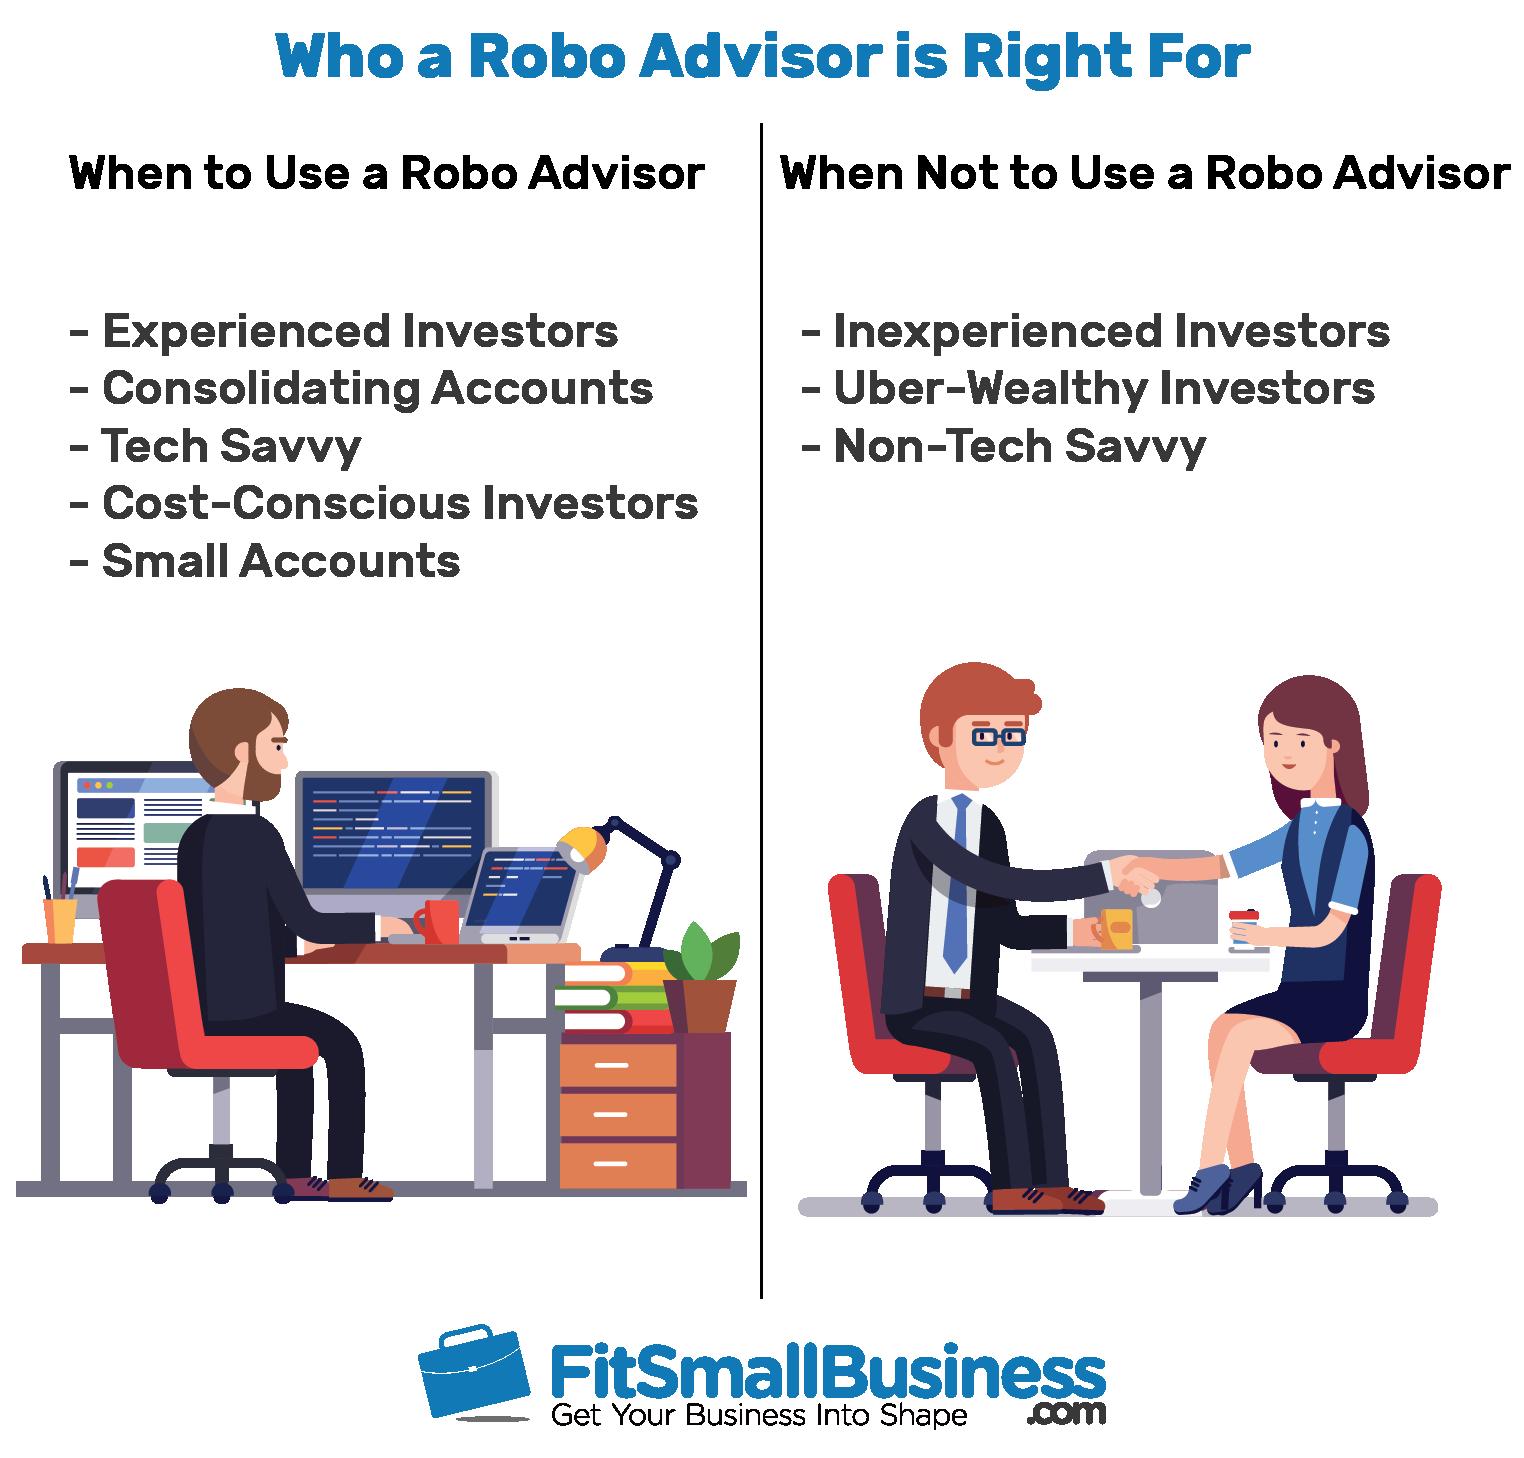 Who a Robo Advisor is Right For - robo advisors